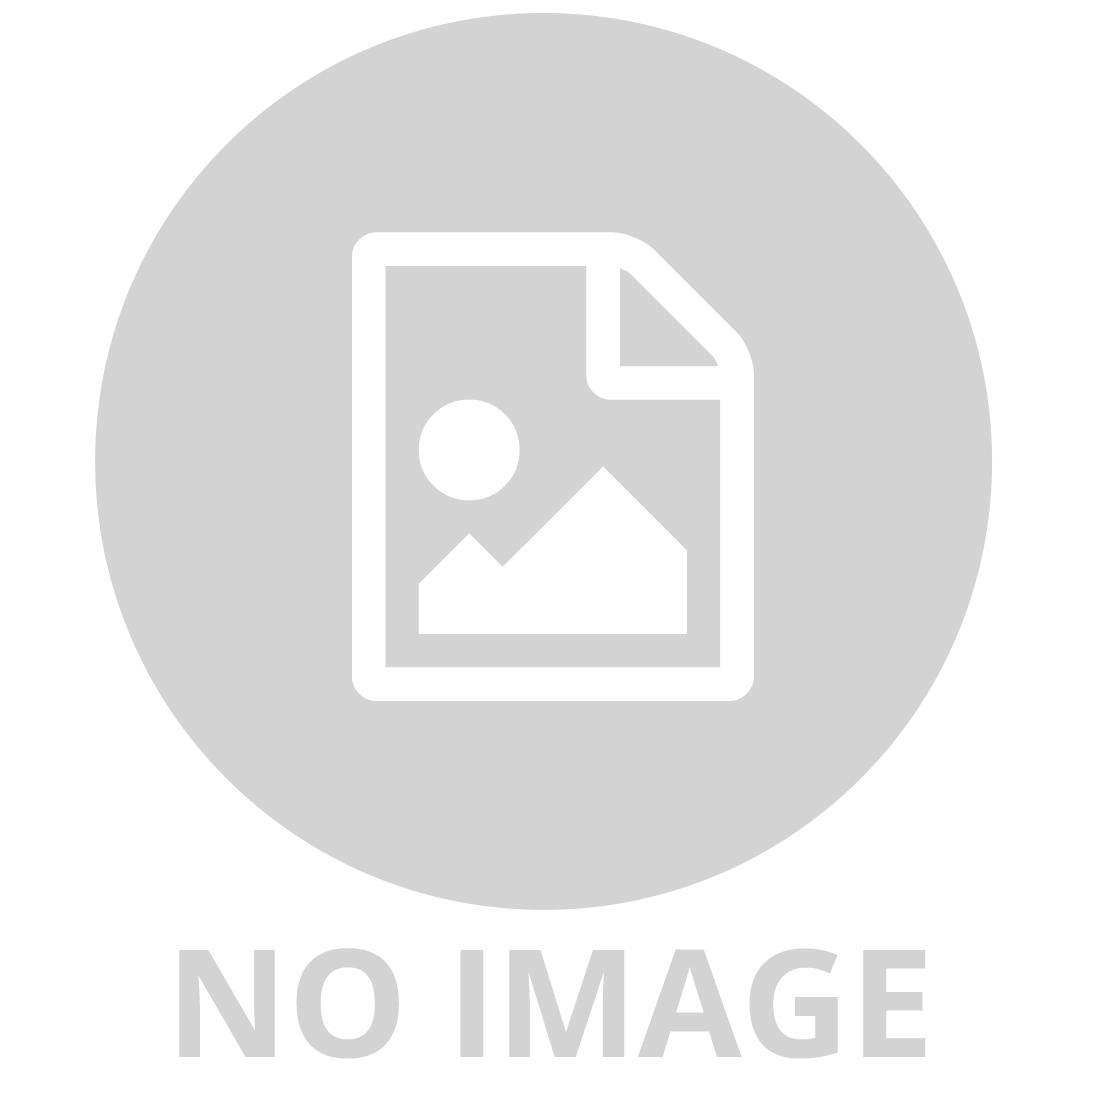 TAMIYA TS 85 BRIGHT MICA RED SPRAY PAINT FOR PLASTICS